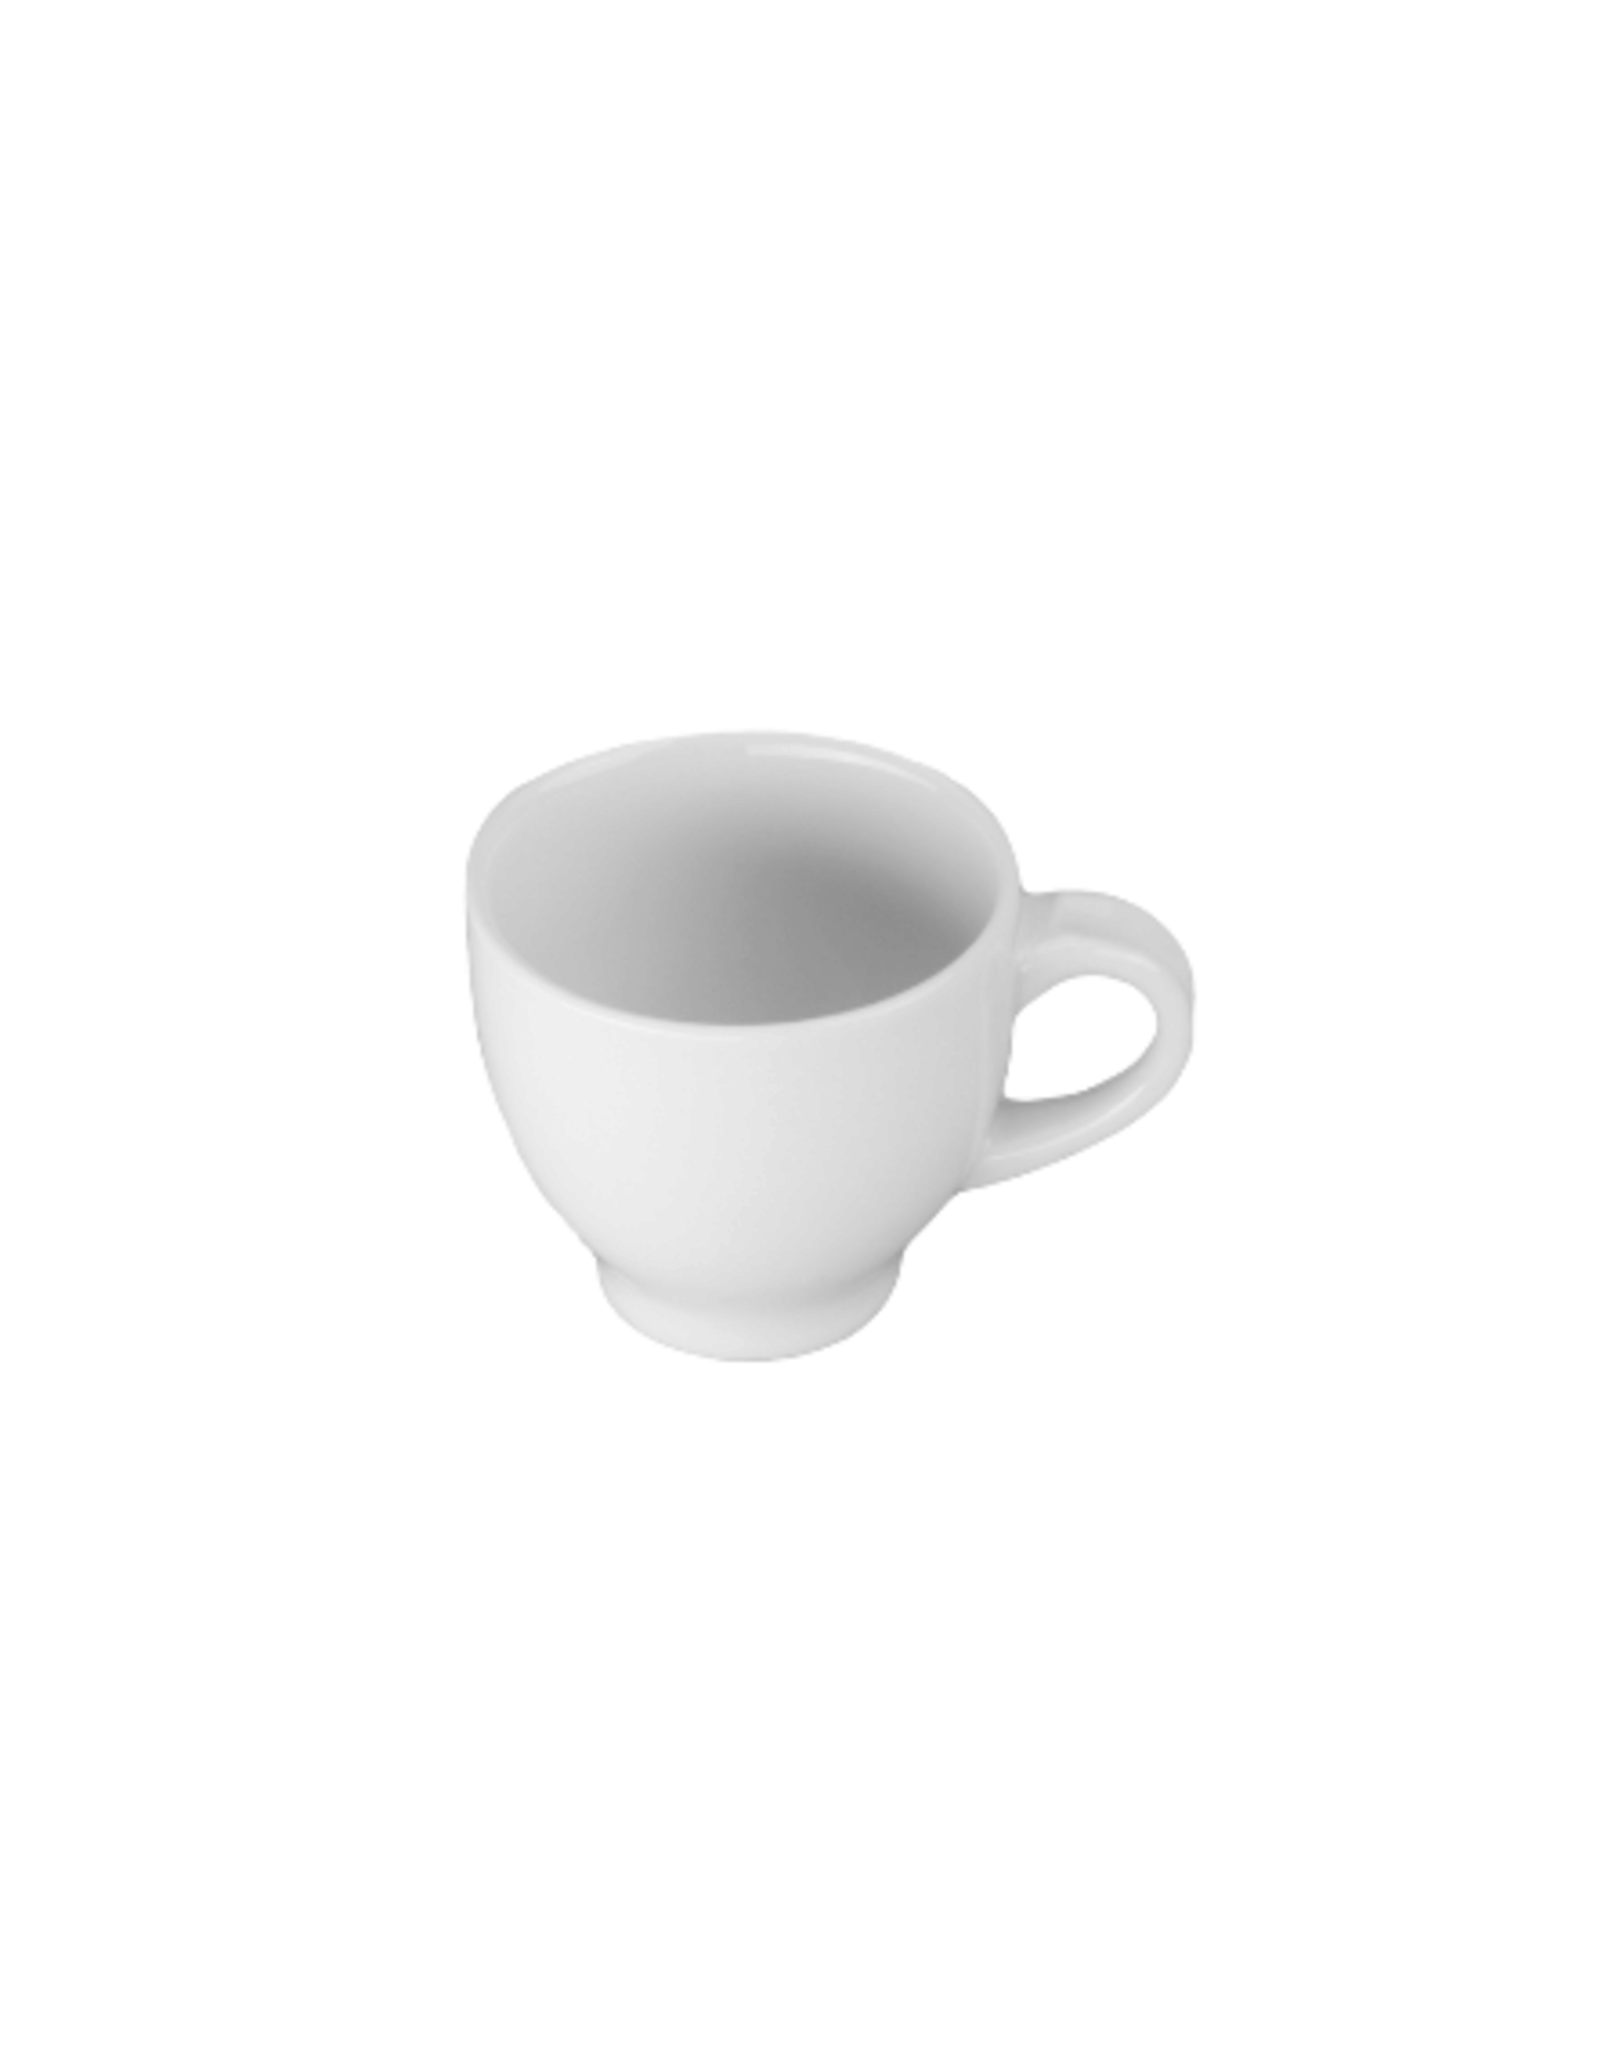 BIA Cordon Bleu Demi Cup Indented Handle 3 oz